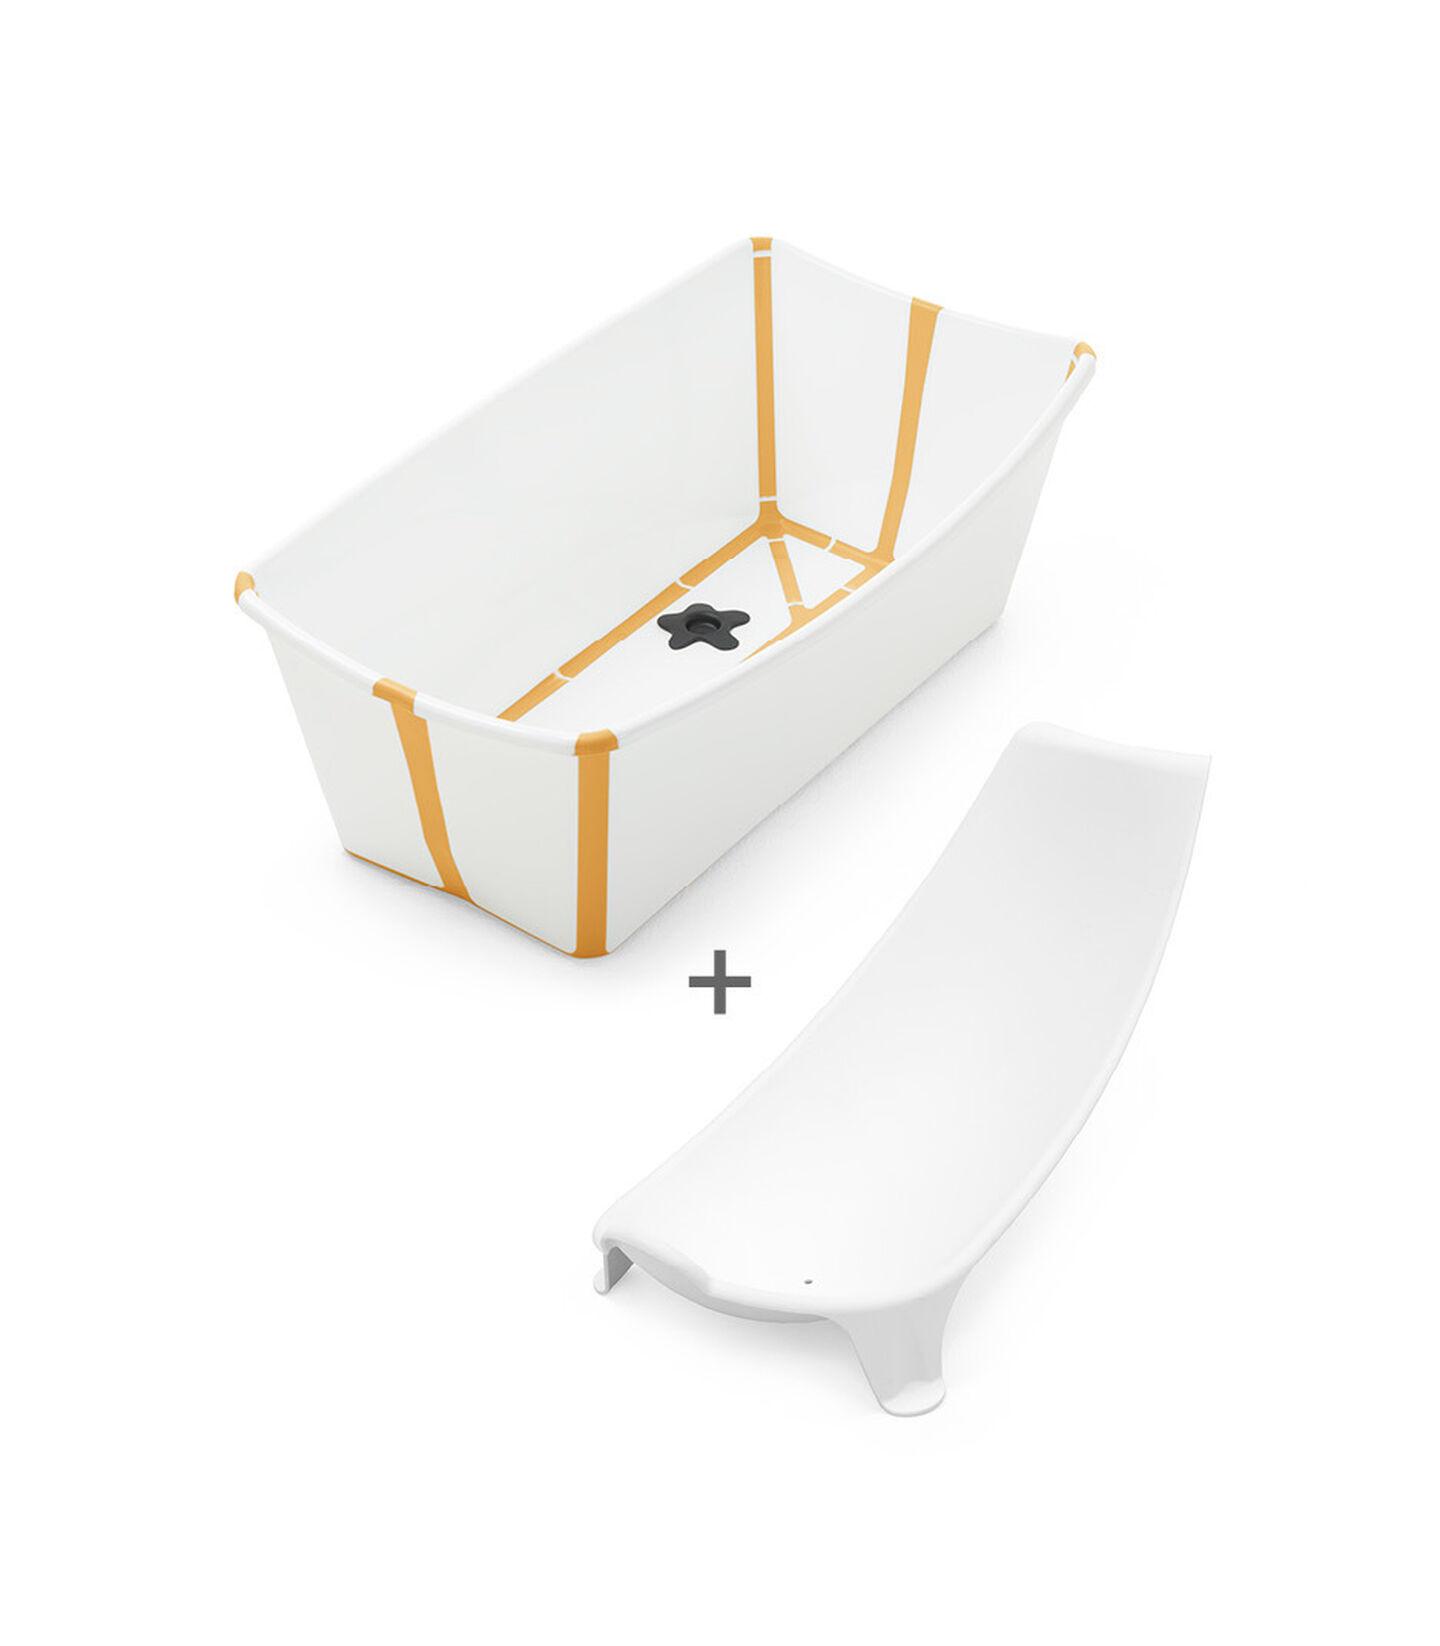 Stokke® Flexi Bath® Bundle - Bath Tub and Newborn Support, White Yellow.